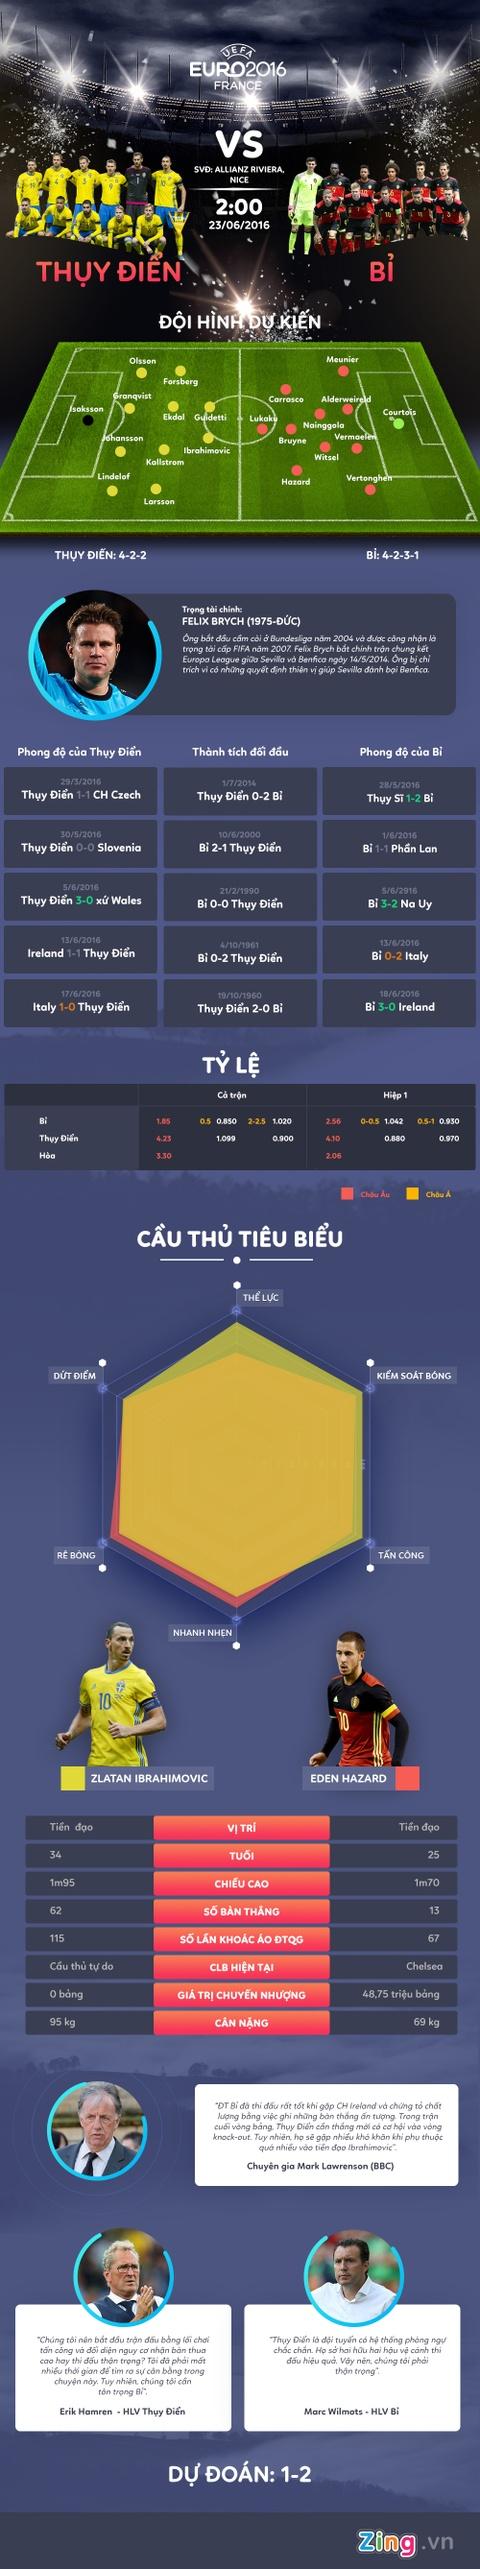 Thuy Dien vs Bi: Chao tam biet Ibrahimovic hinh anh 1